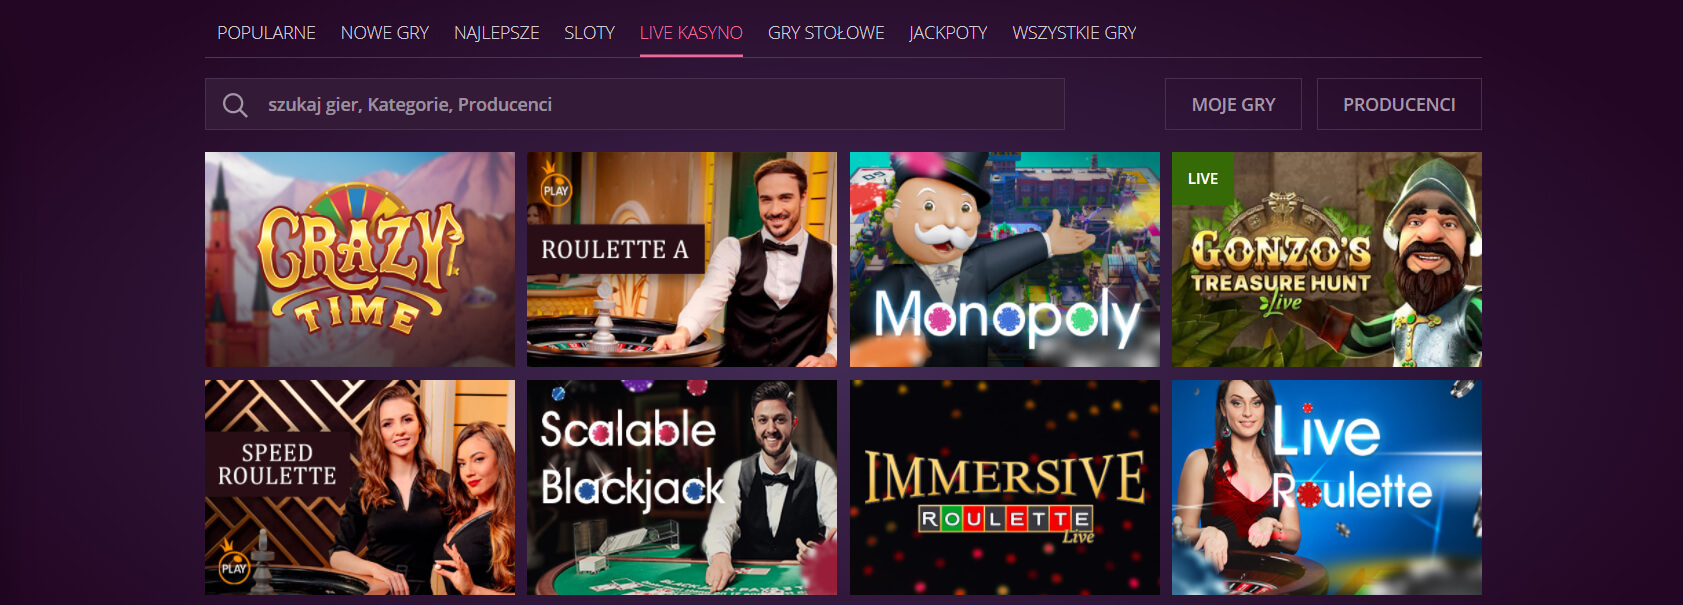 malina kasyno na żywo screenshot